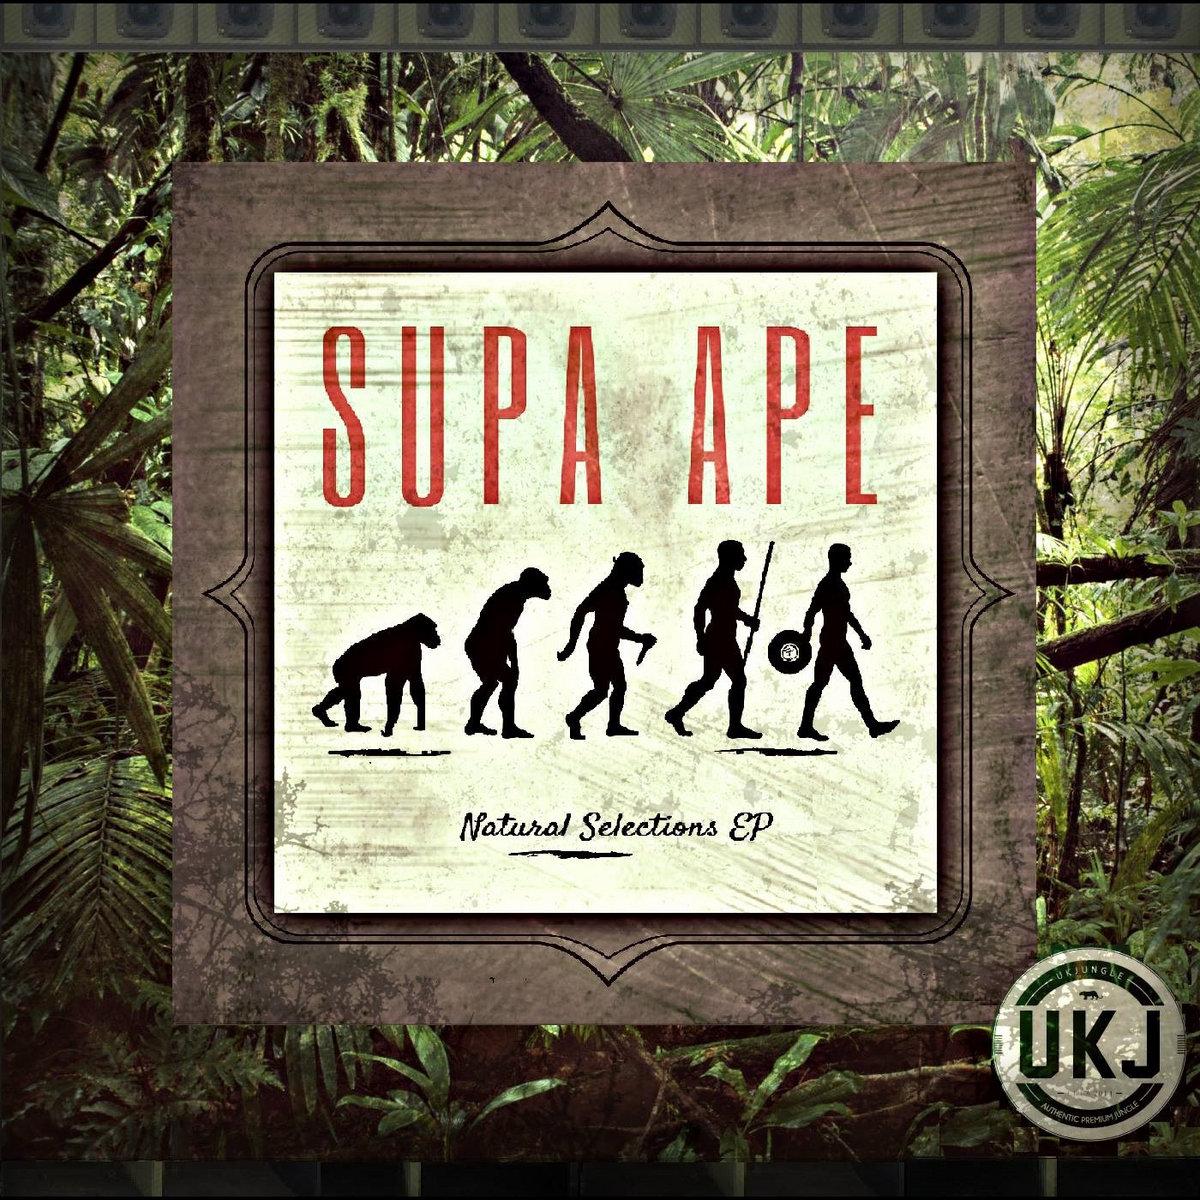 Supa ape greetings from jah ukj supa ape greetings from jah m4hsunfo